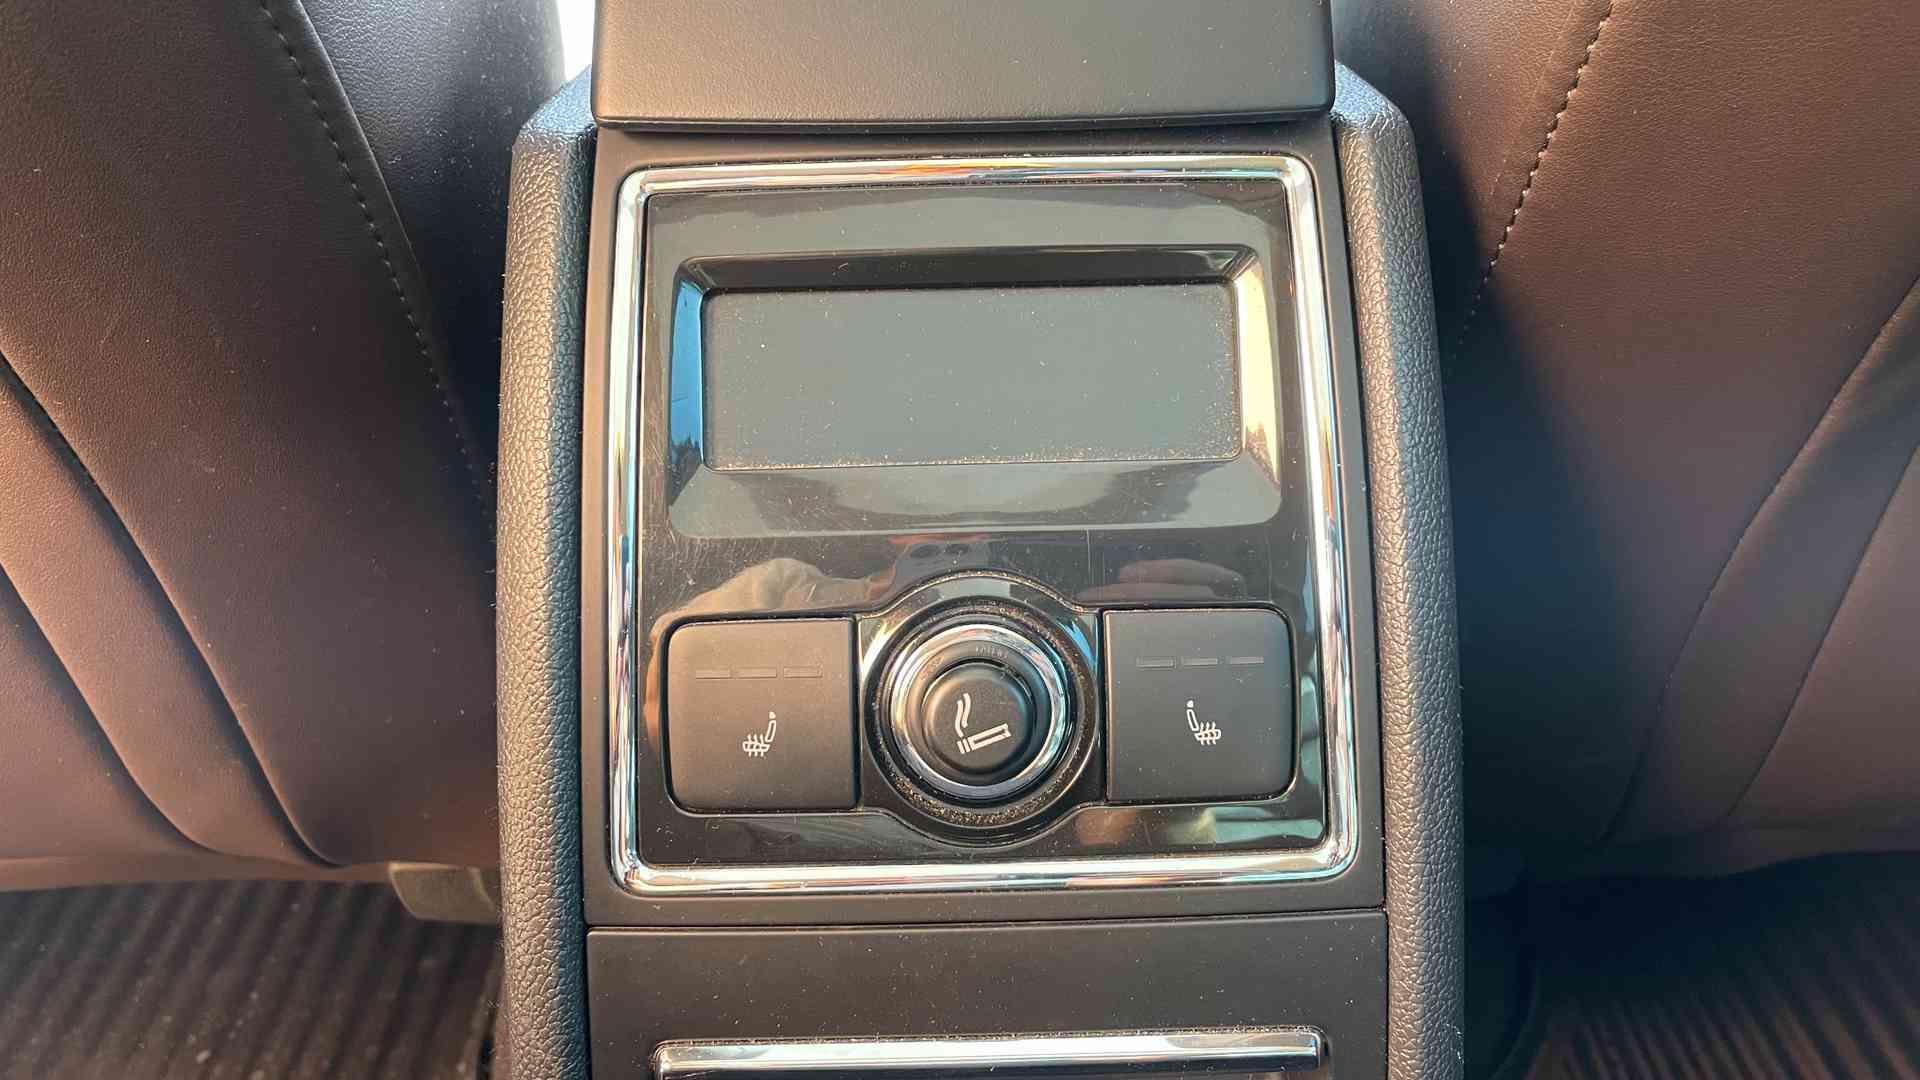 Škoda Superb 3.6 FSI V6 191kW 4x4 L&K - foto 13